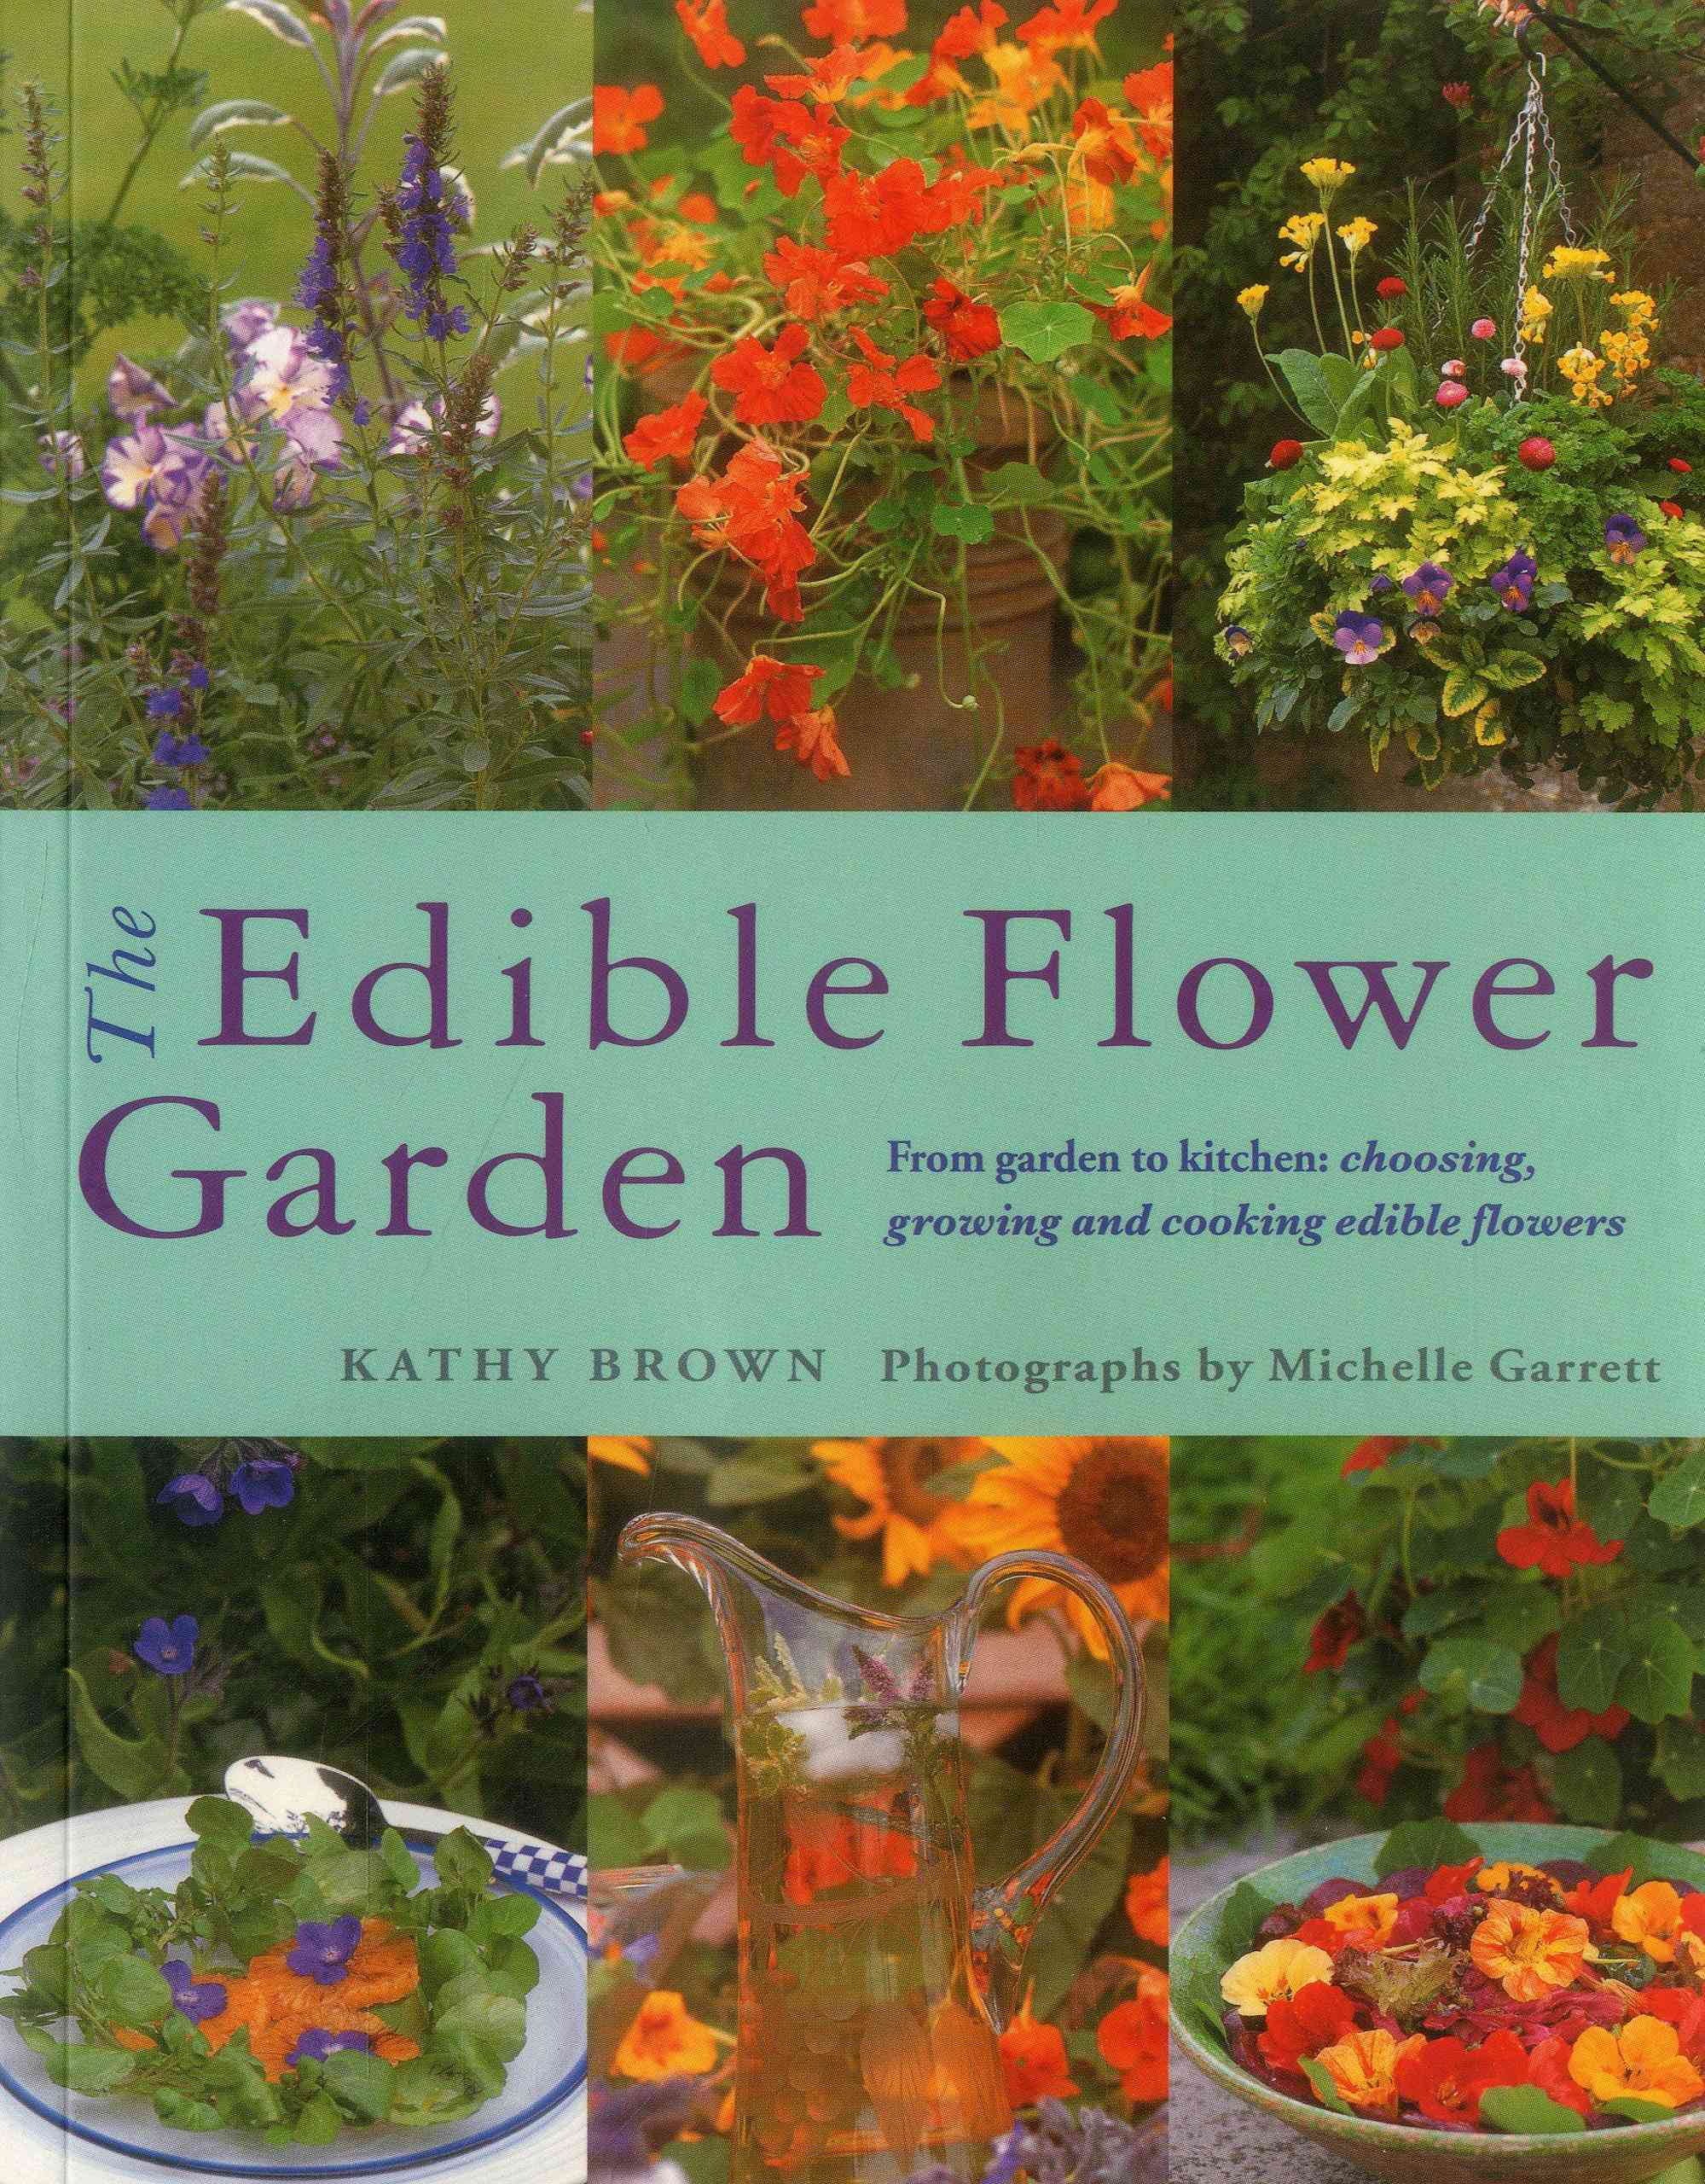 The Edible Flower Garden From Garden to Kitchen Choosing